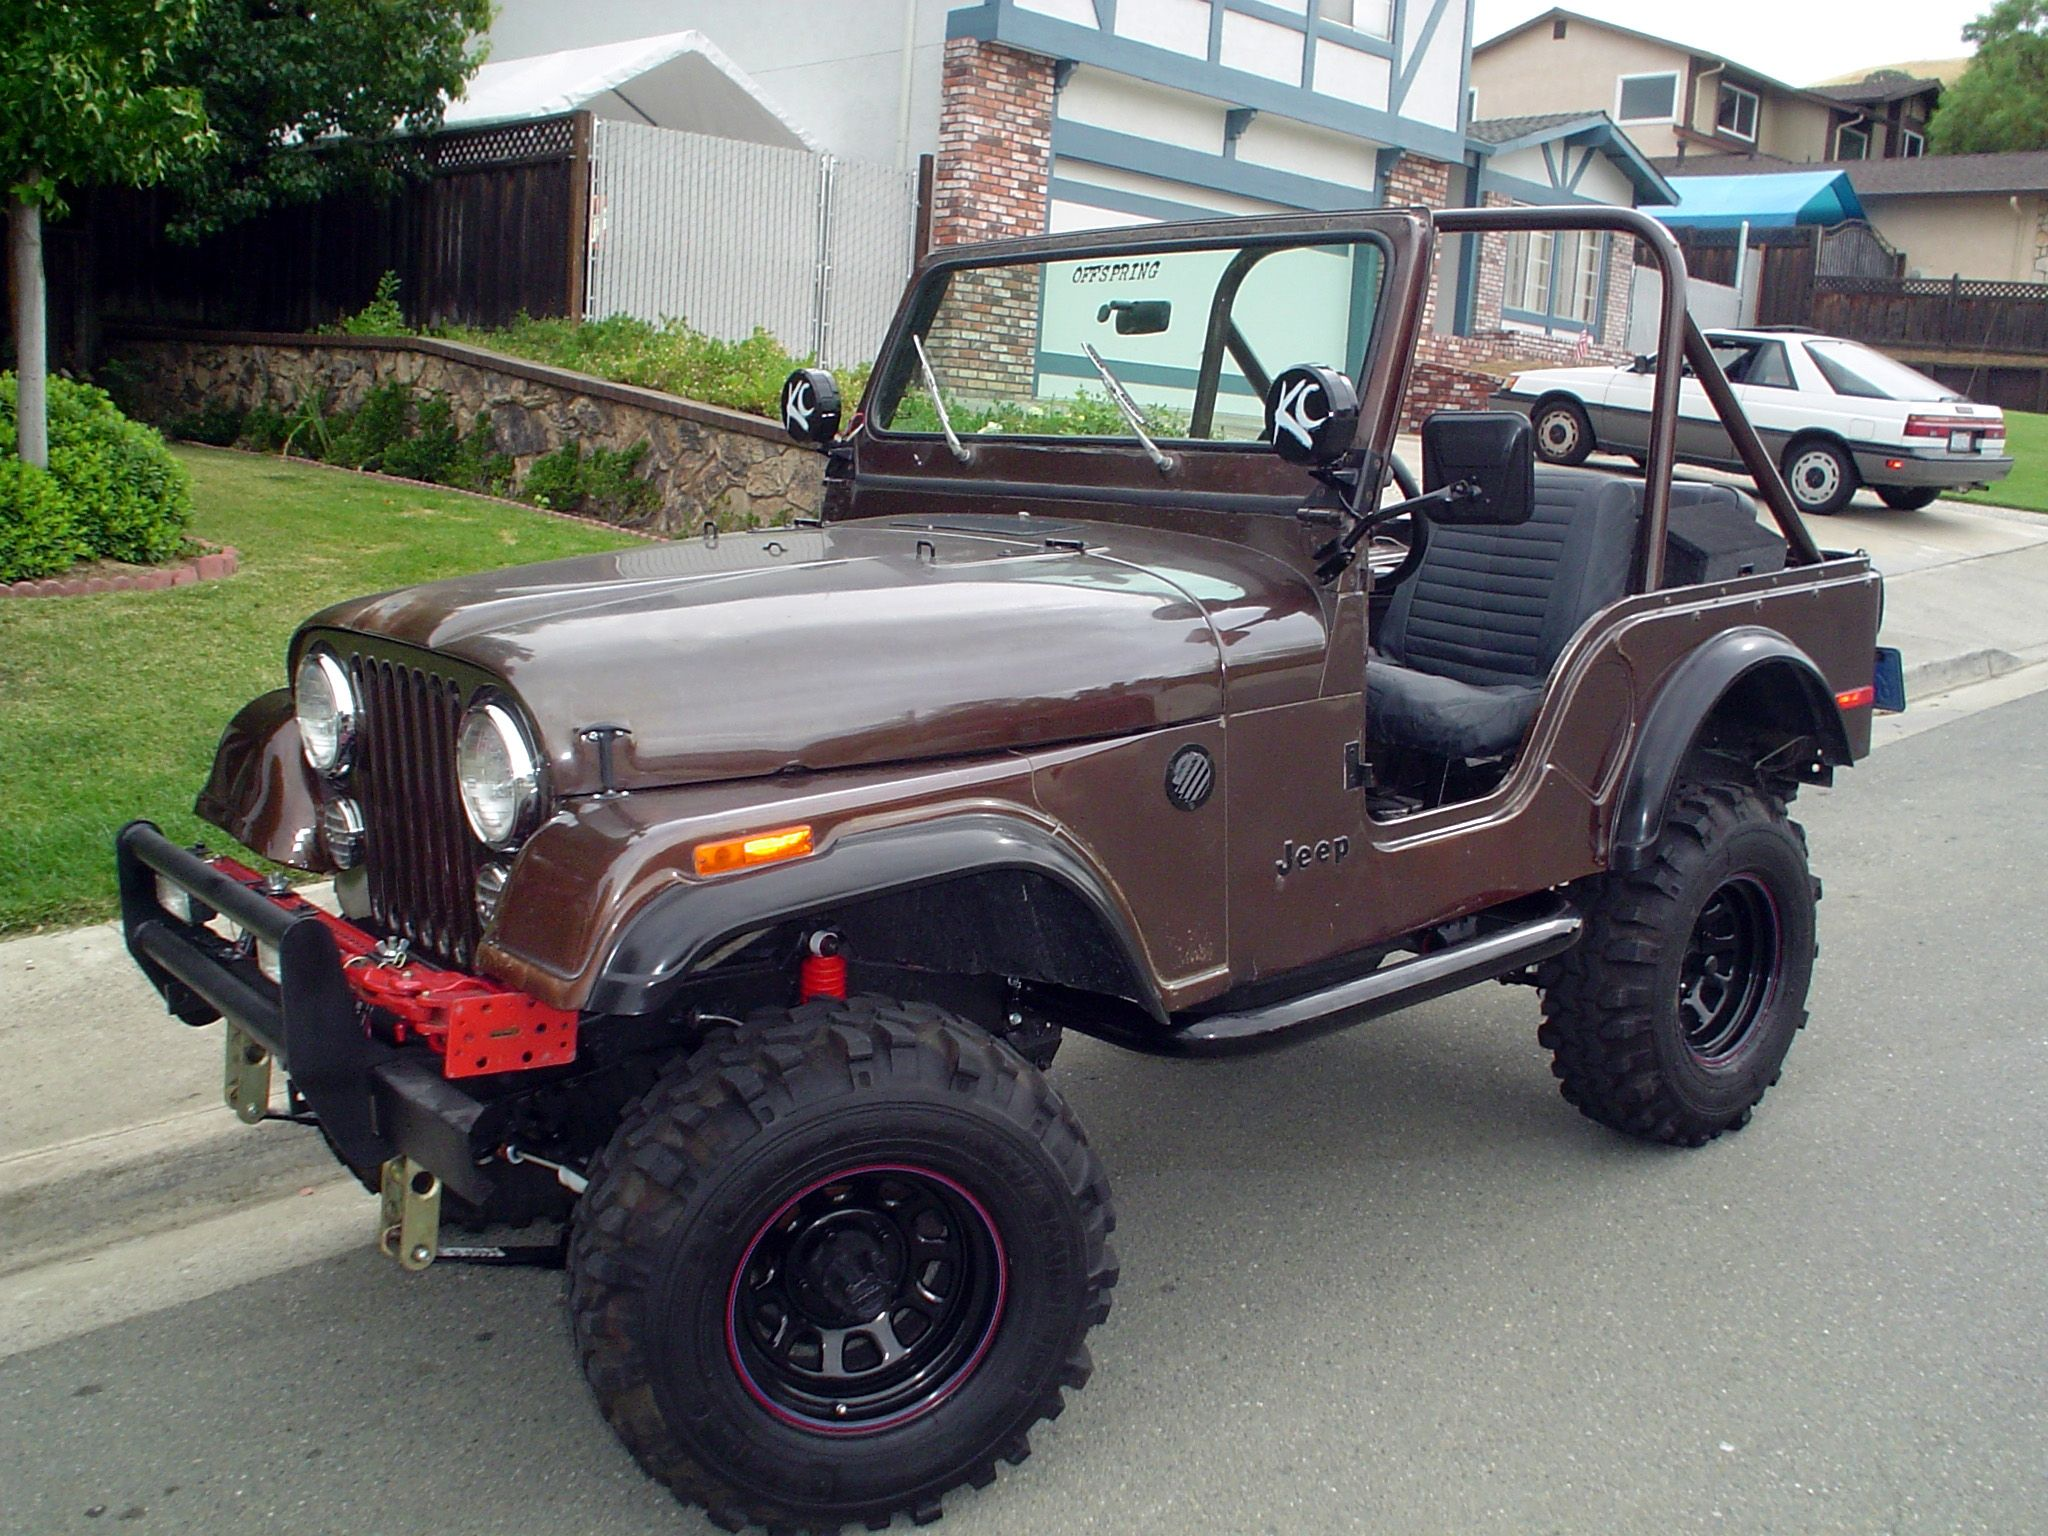 jeep cj5 - Buscar con Google | Restauración jeep KORANDO K4D | Pinterest